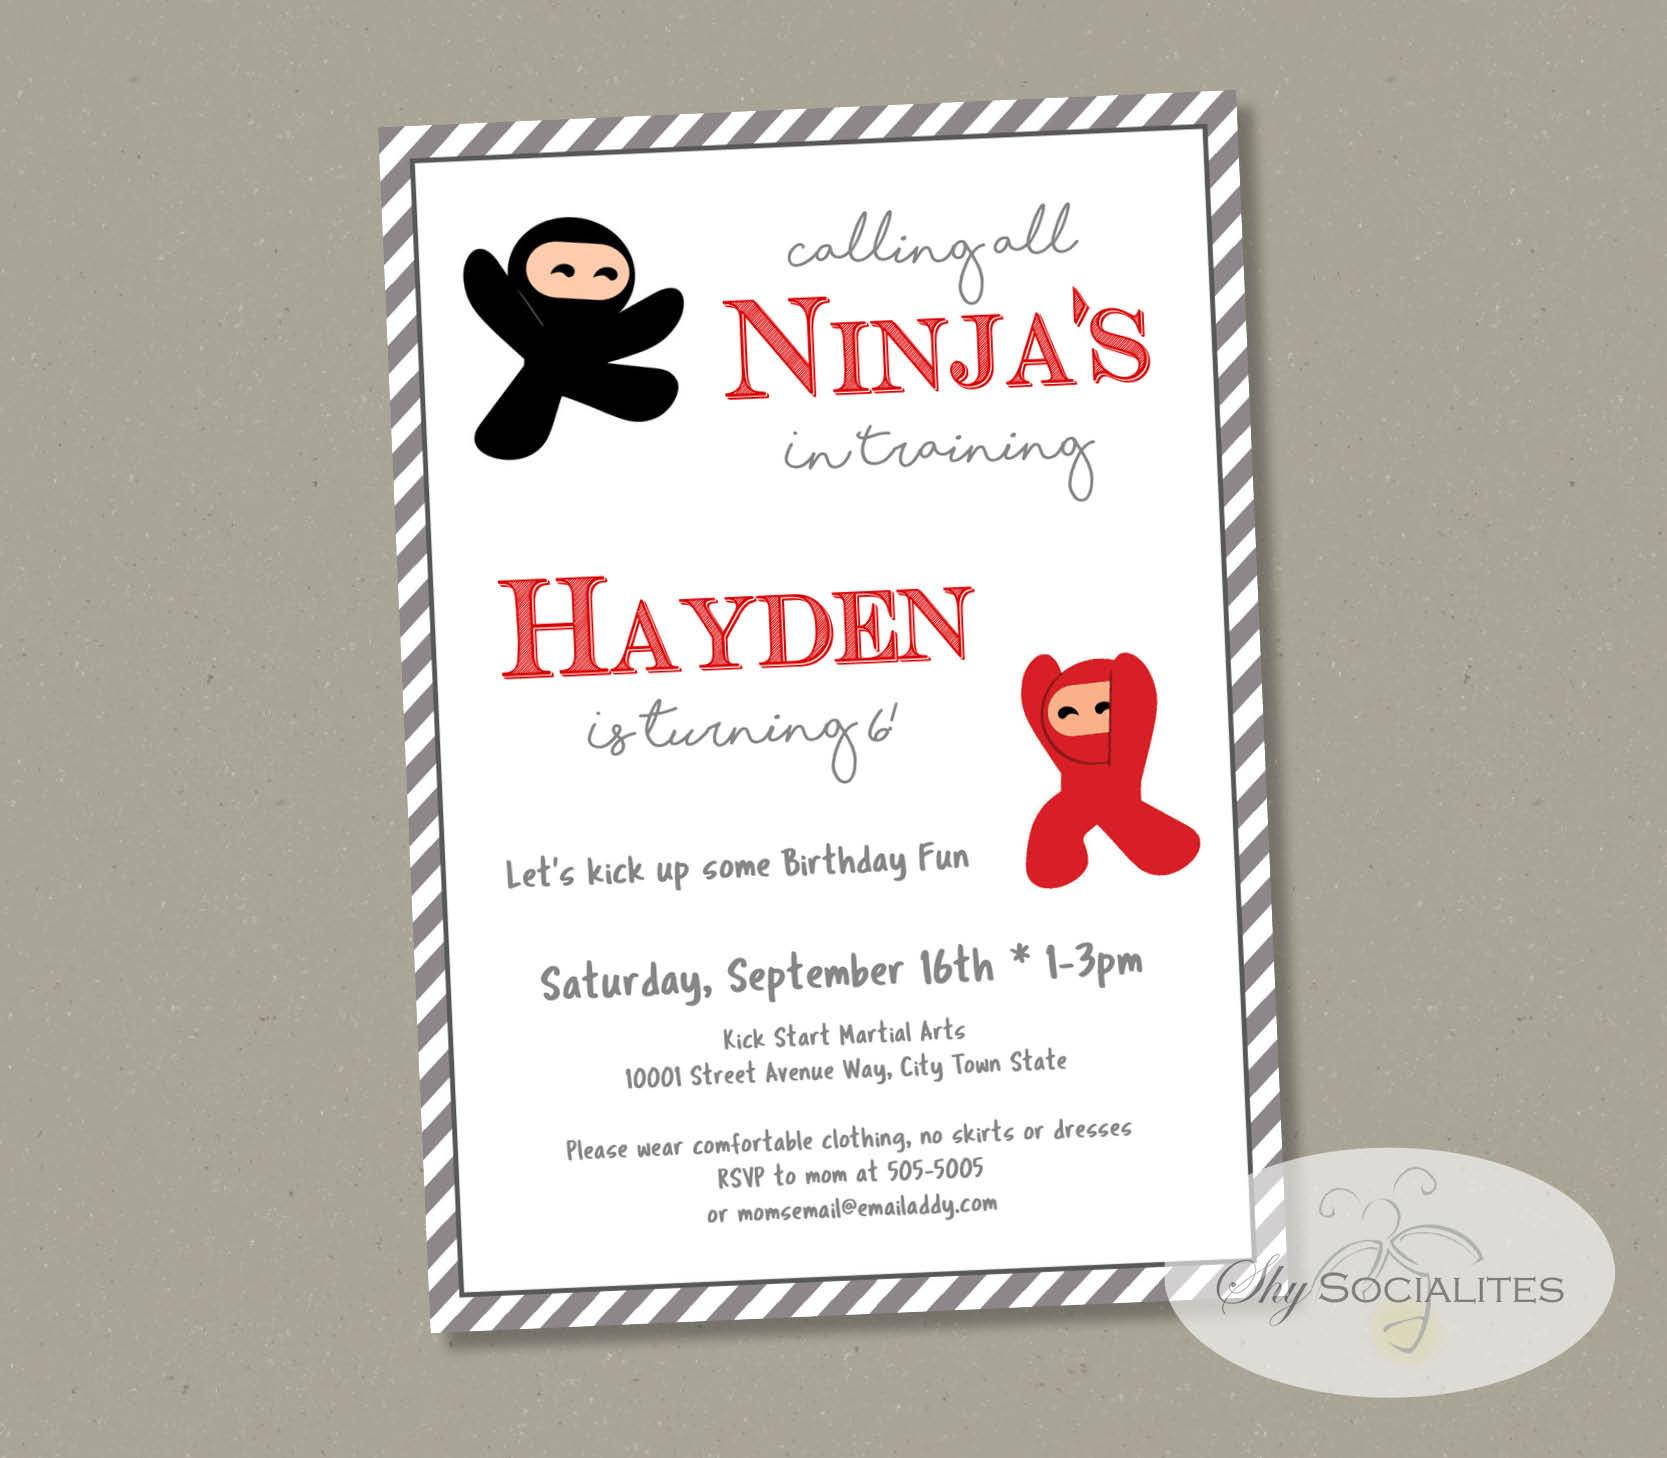 Ninja Party Invitation Martial Arts Birthday Karate